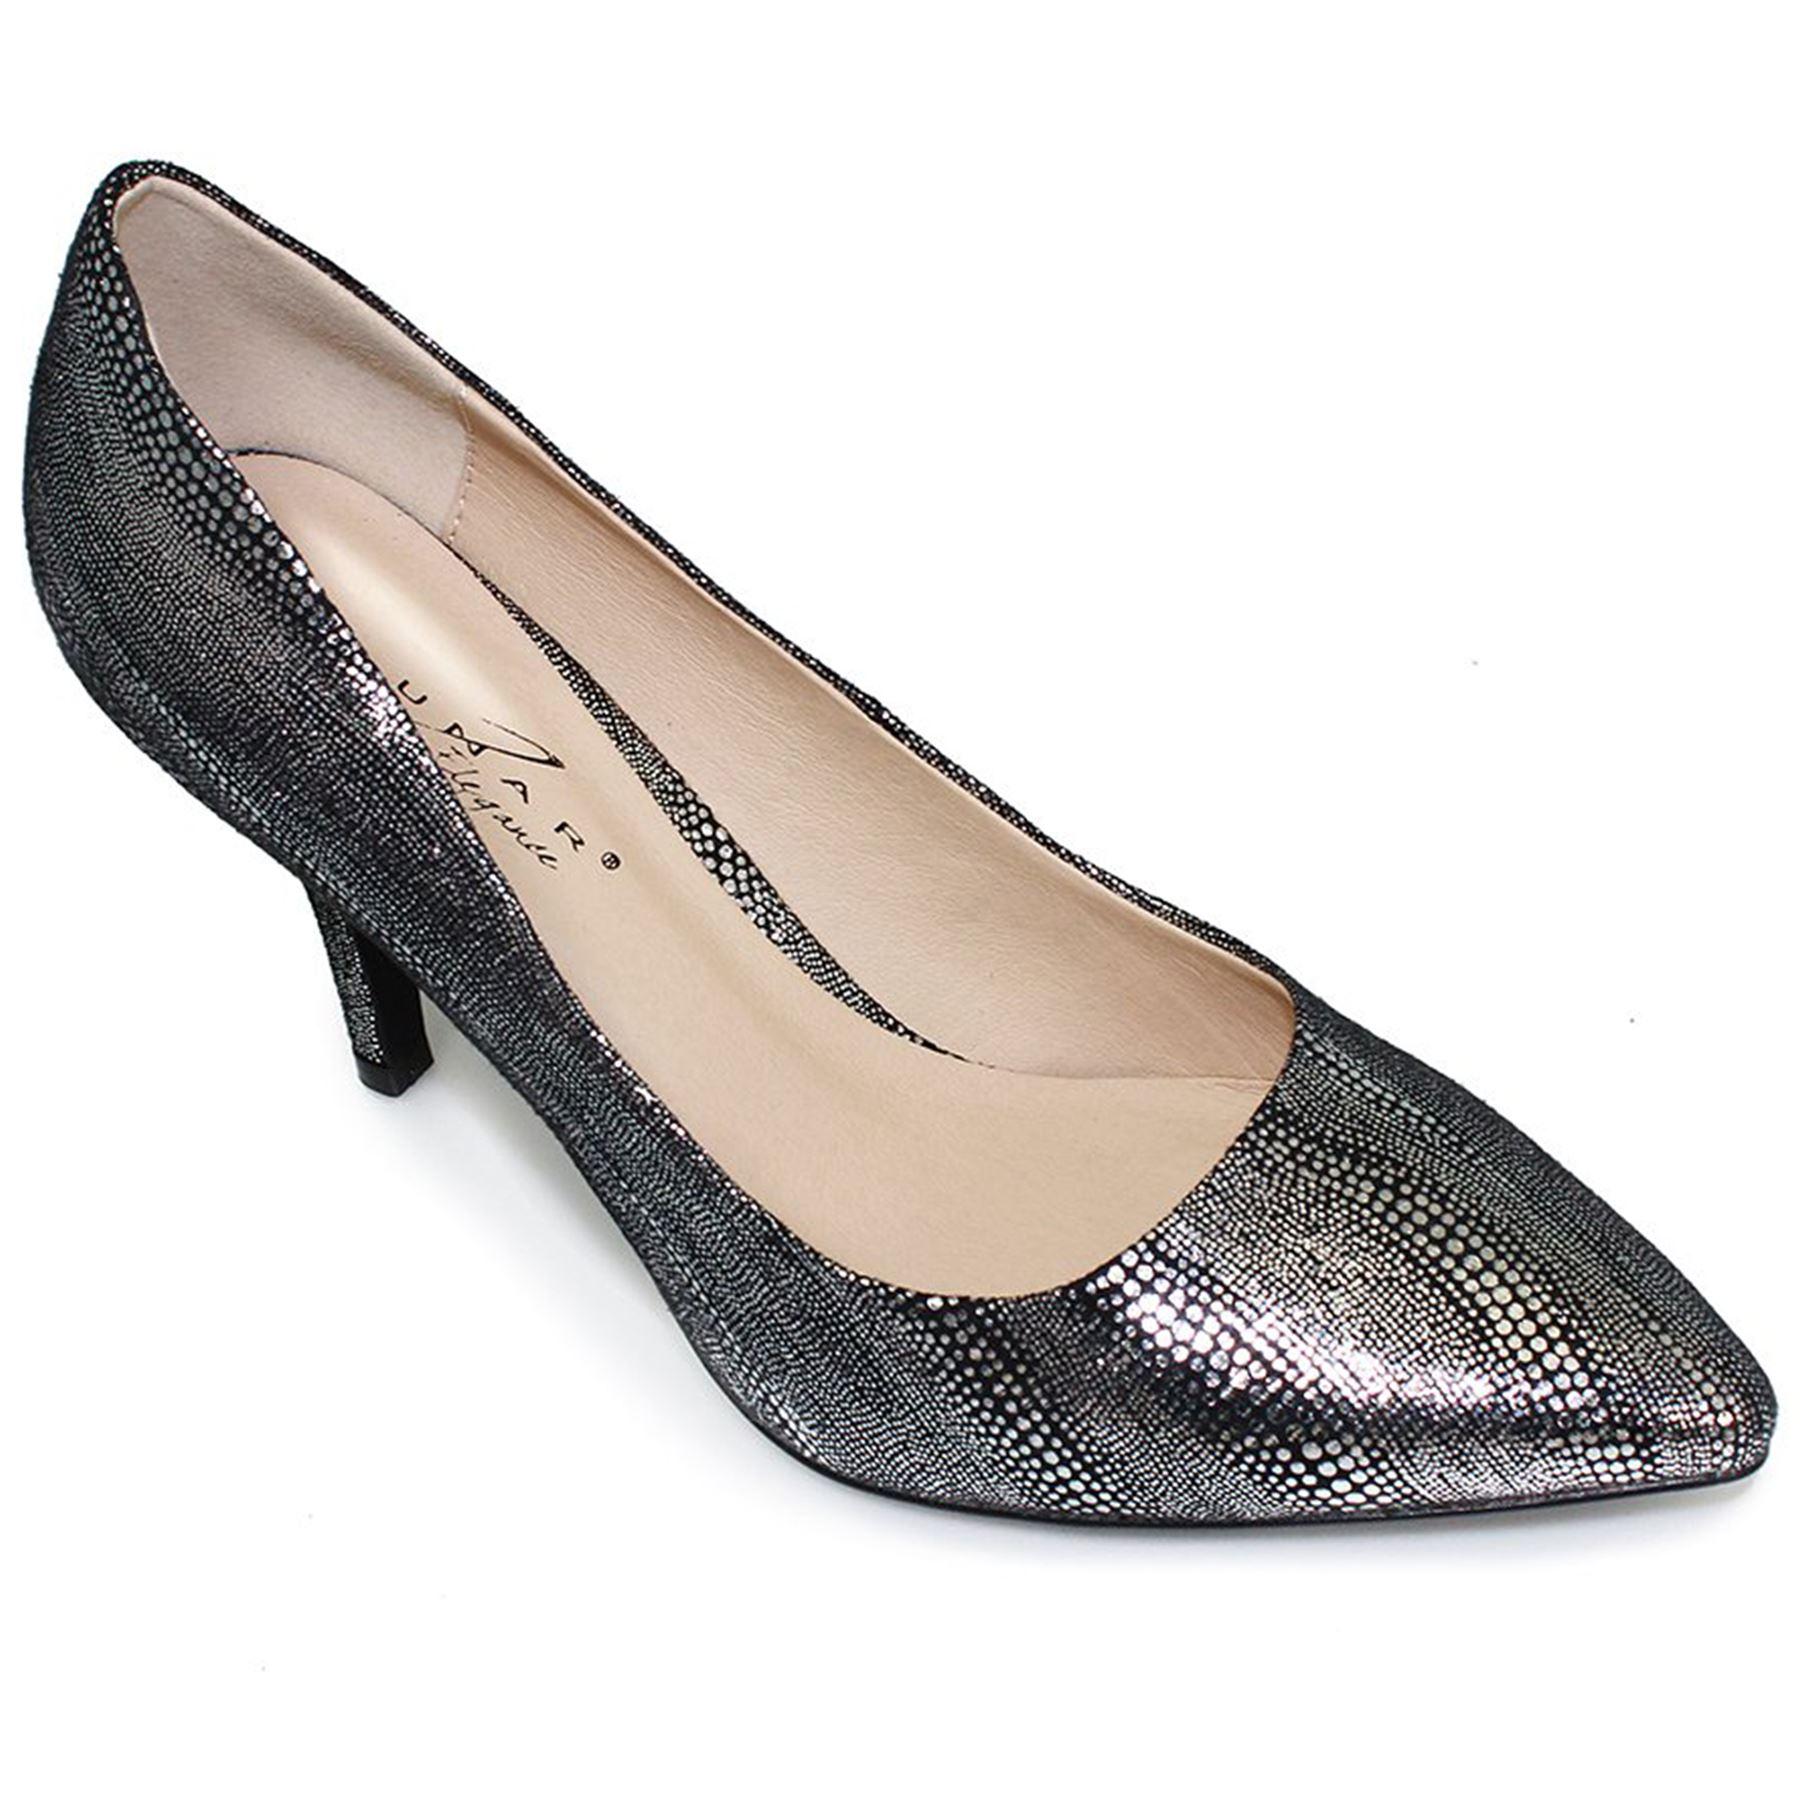 FLV346 Rome Niedrig Courts Damenschuhe Slip On Pointed Toe Snake Niedrig Rome Heels Clutch Bag fe8e77